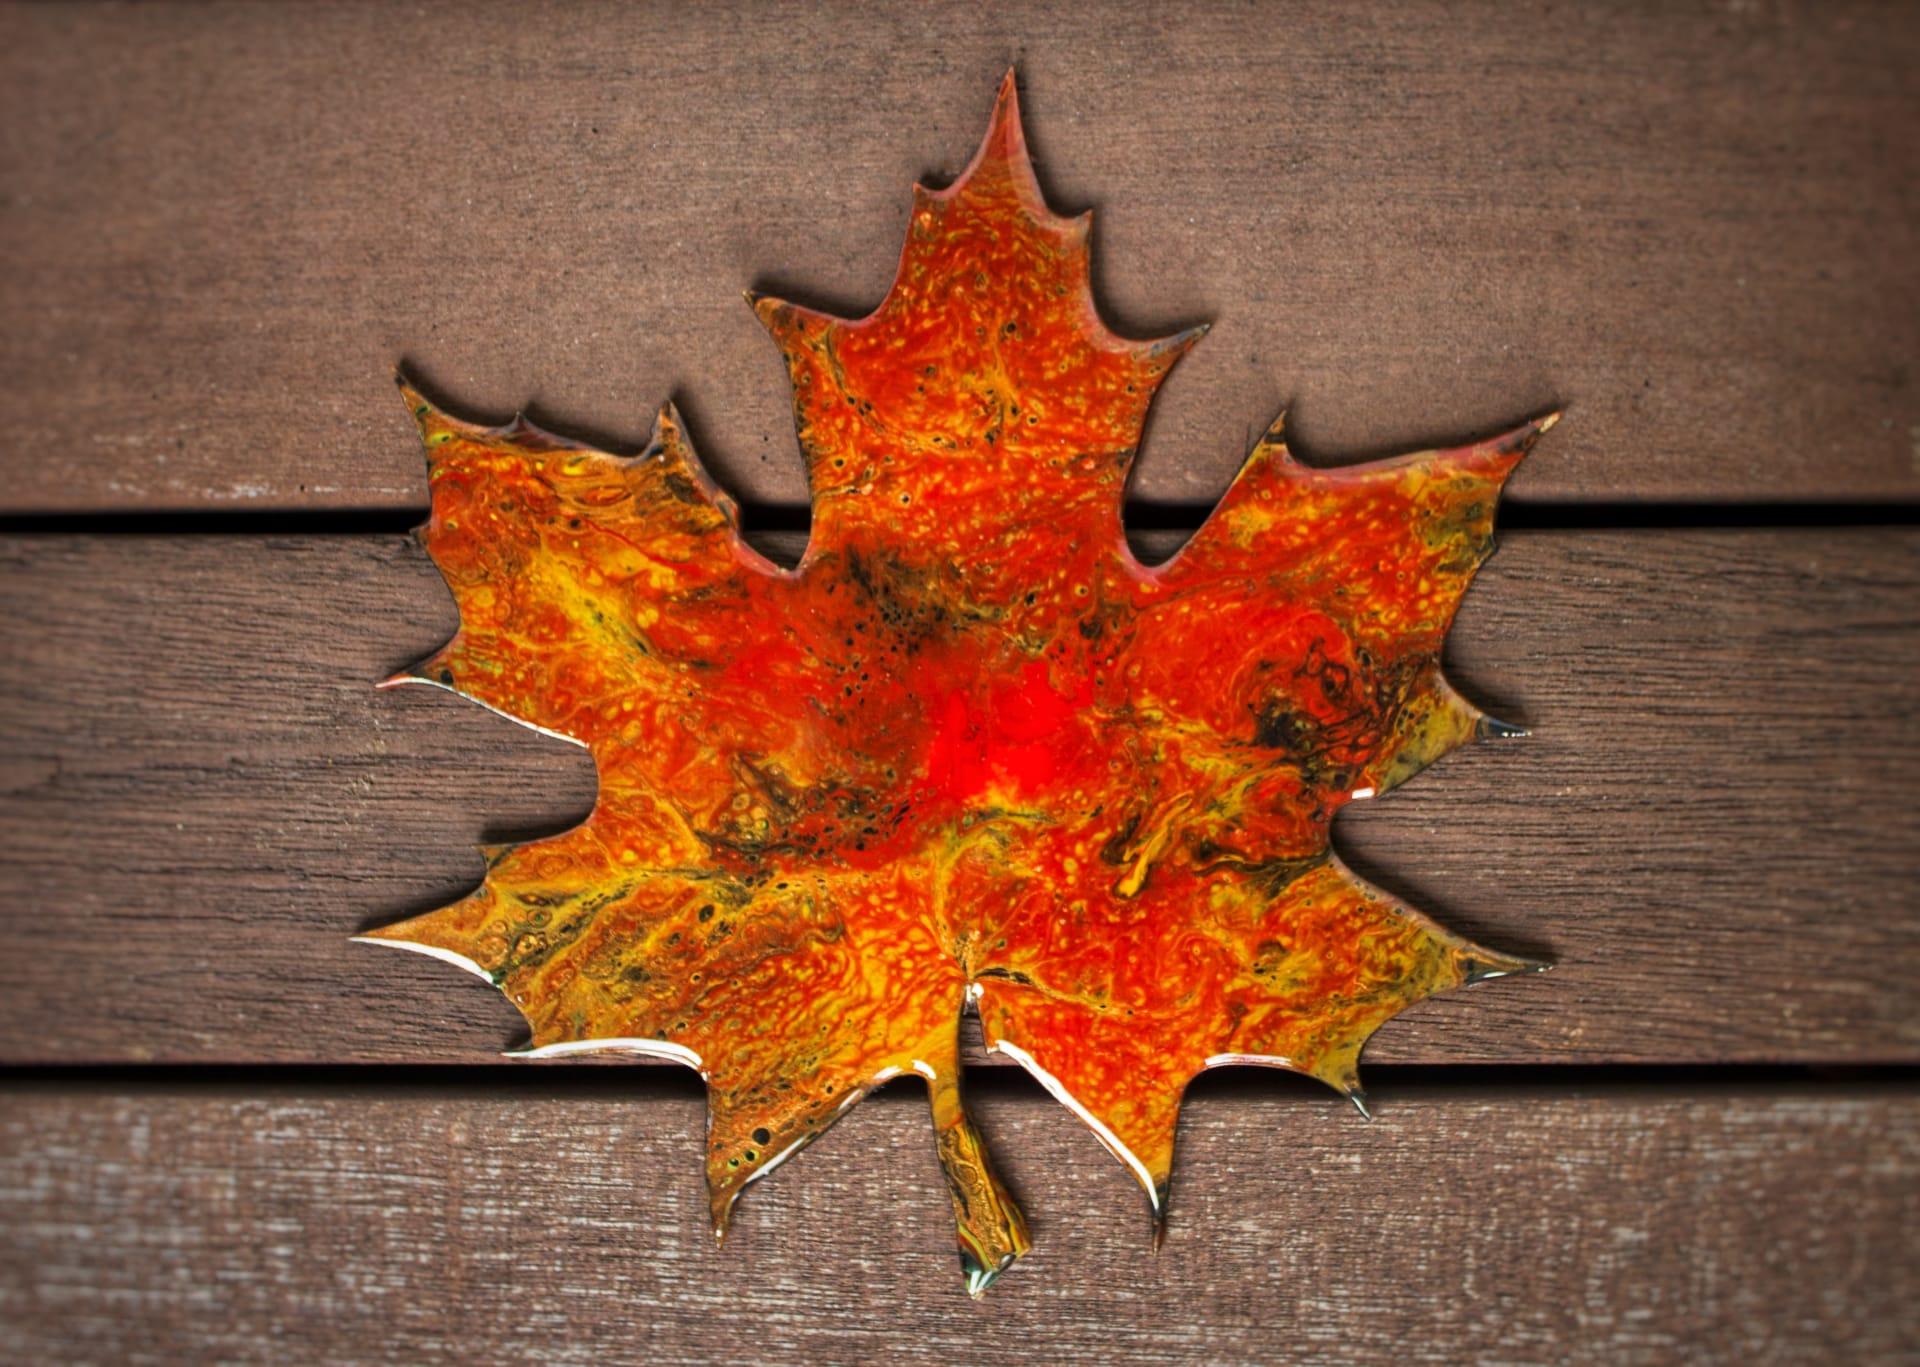 Mozes-Supposes-Acrylic-Pour-Maple-Leaf-Home-Decor_Image-4-w1920.jpg